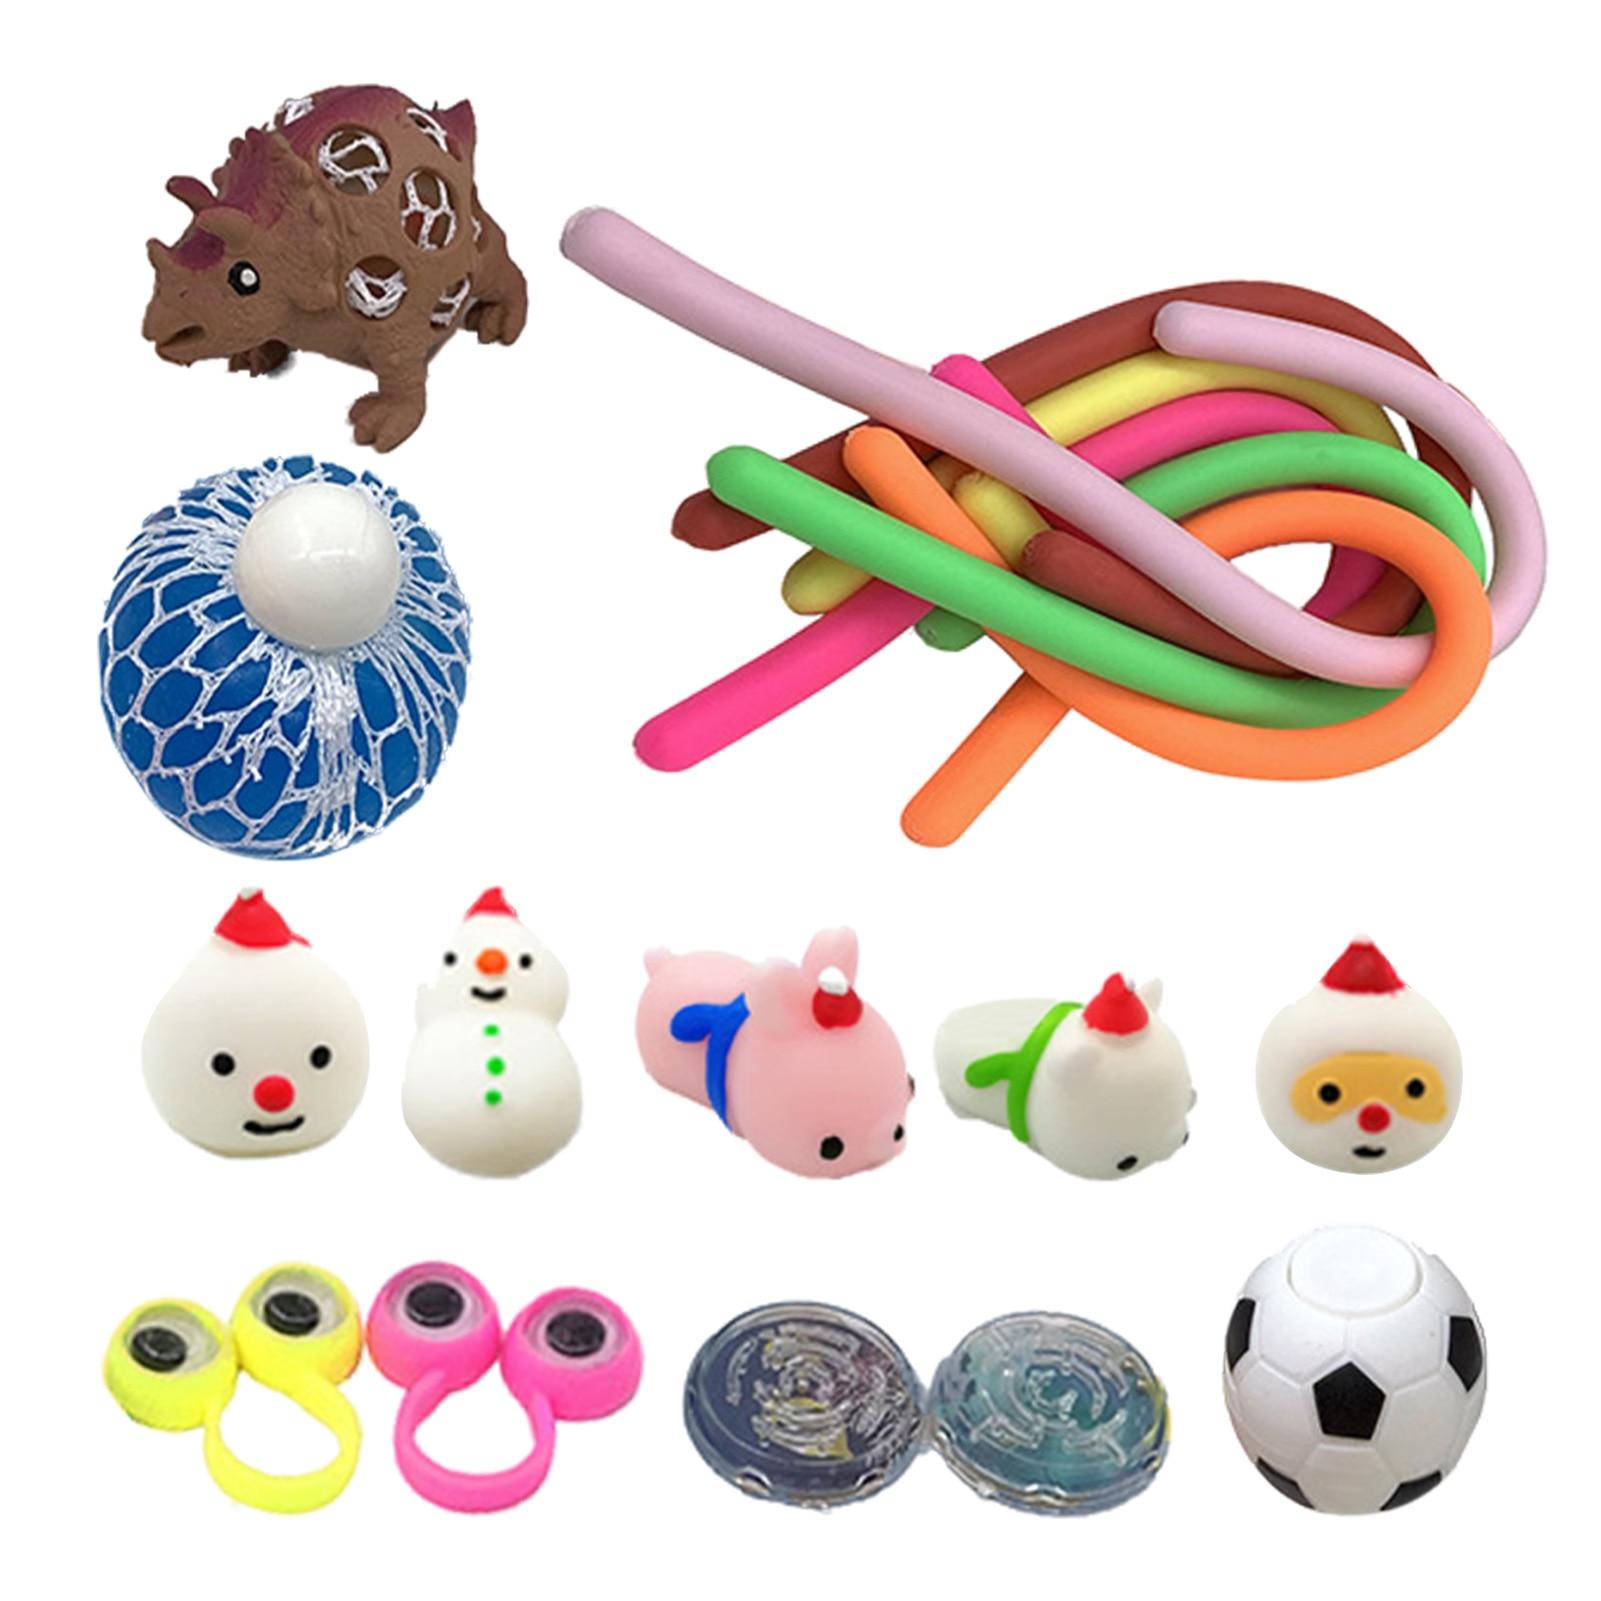 Hot Sell Sensory Fidget Toy Set Stress Relief Toys Bundle For Teens Adults Sensory Toys Anti Stress Ball enlarge